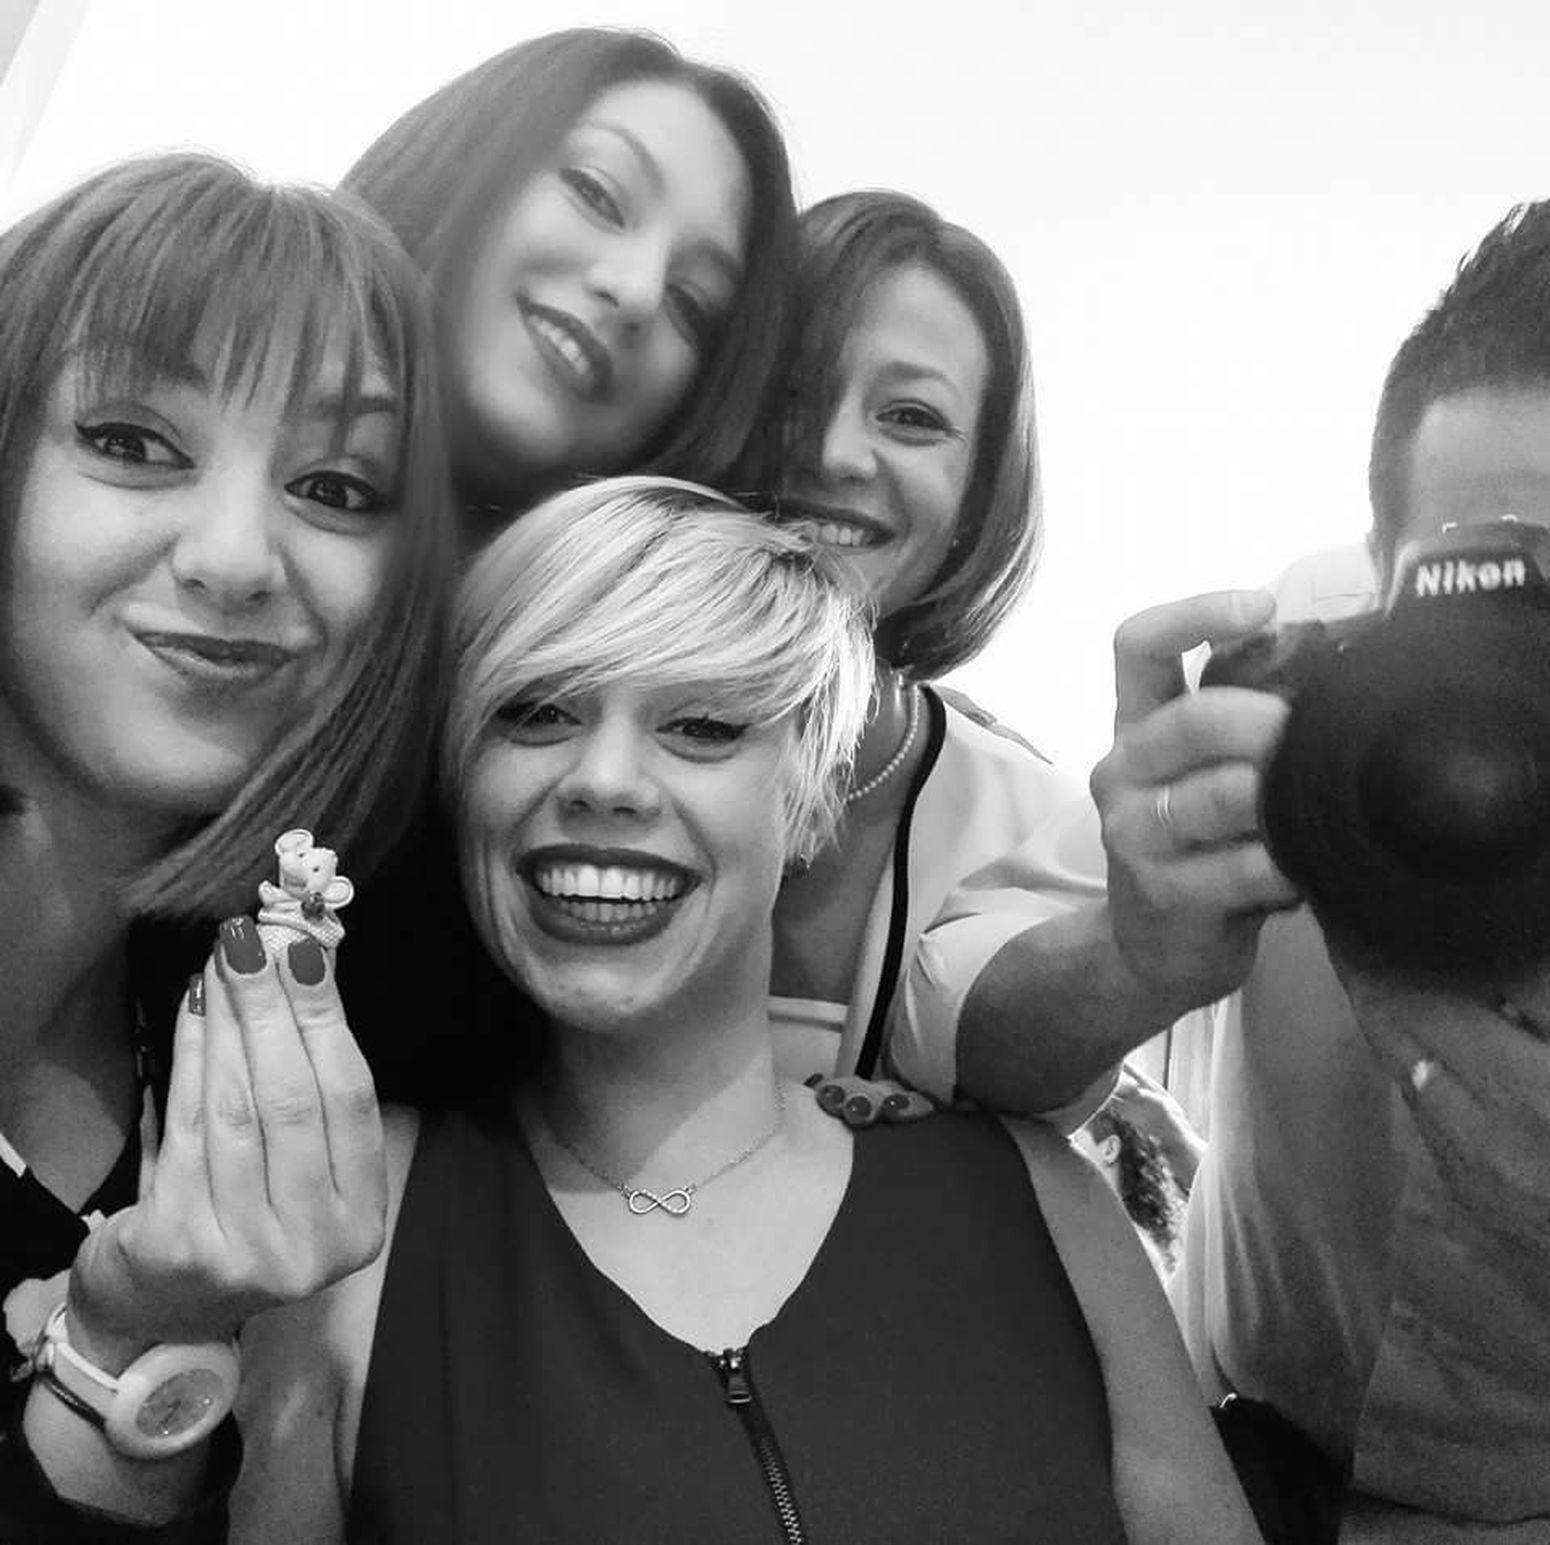 Sisters Happiness Nikonphotography Selfie Women Enjoyment Smiling Beautifulsmiles Lookthecamera